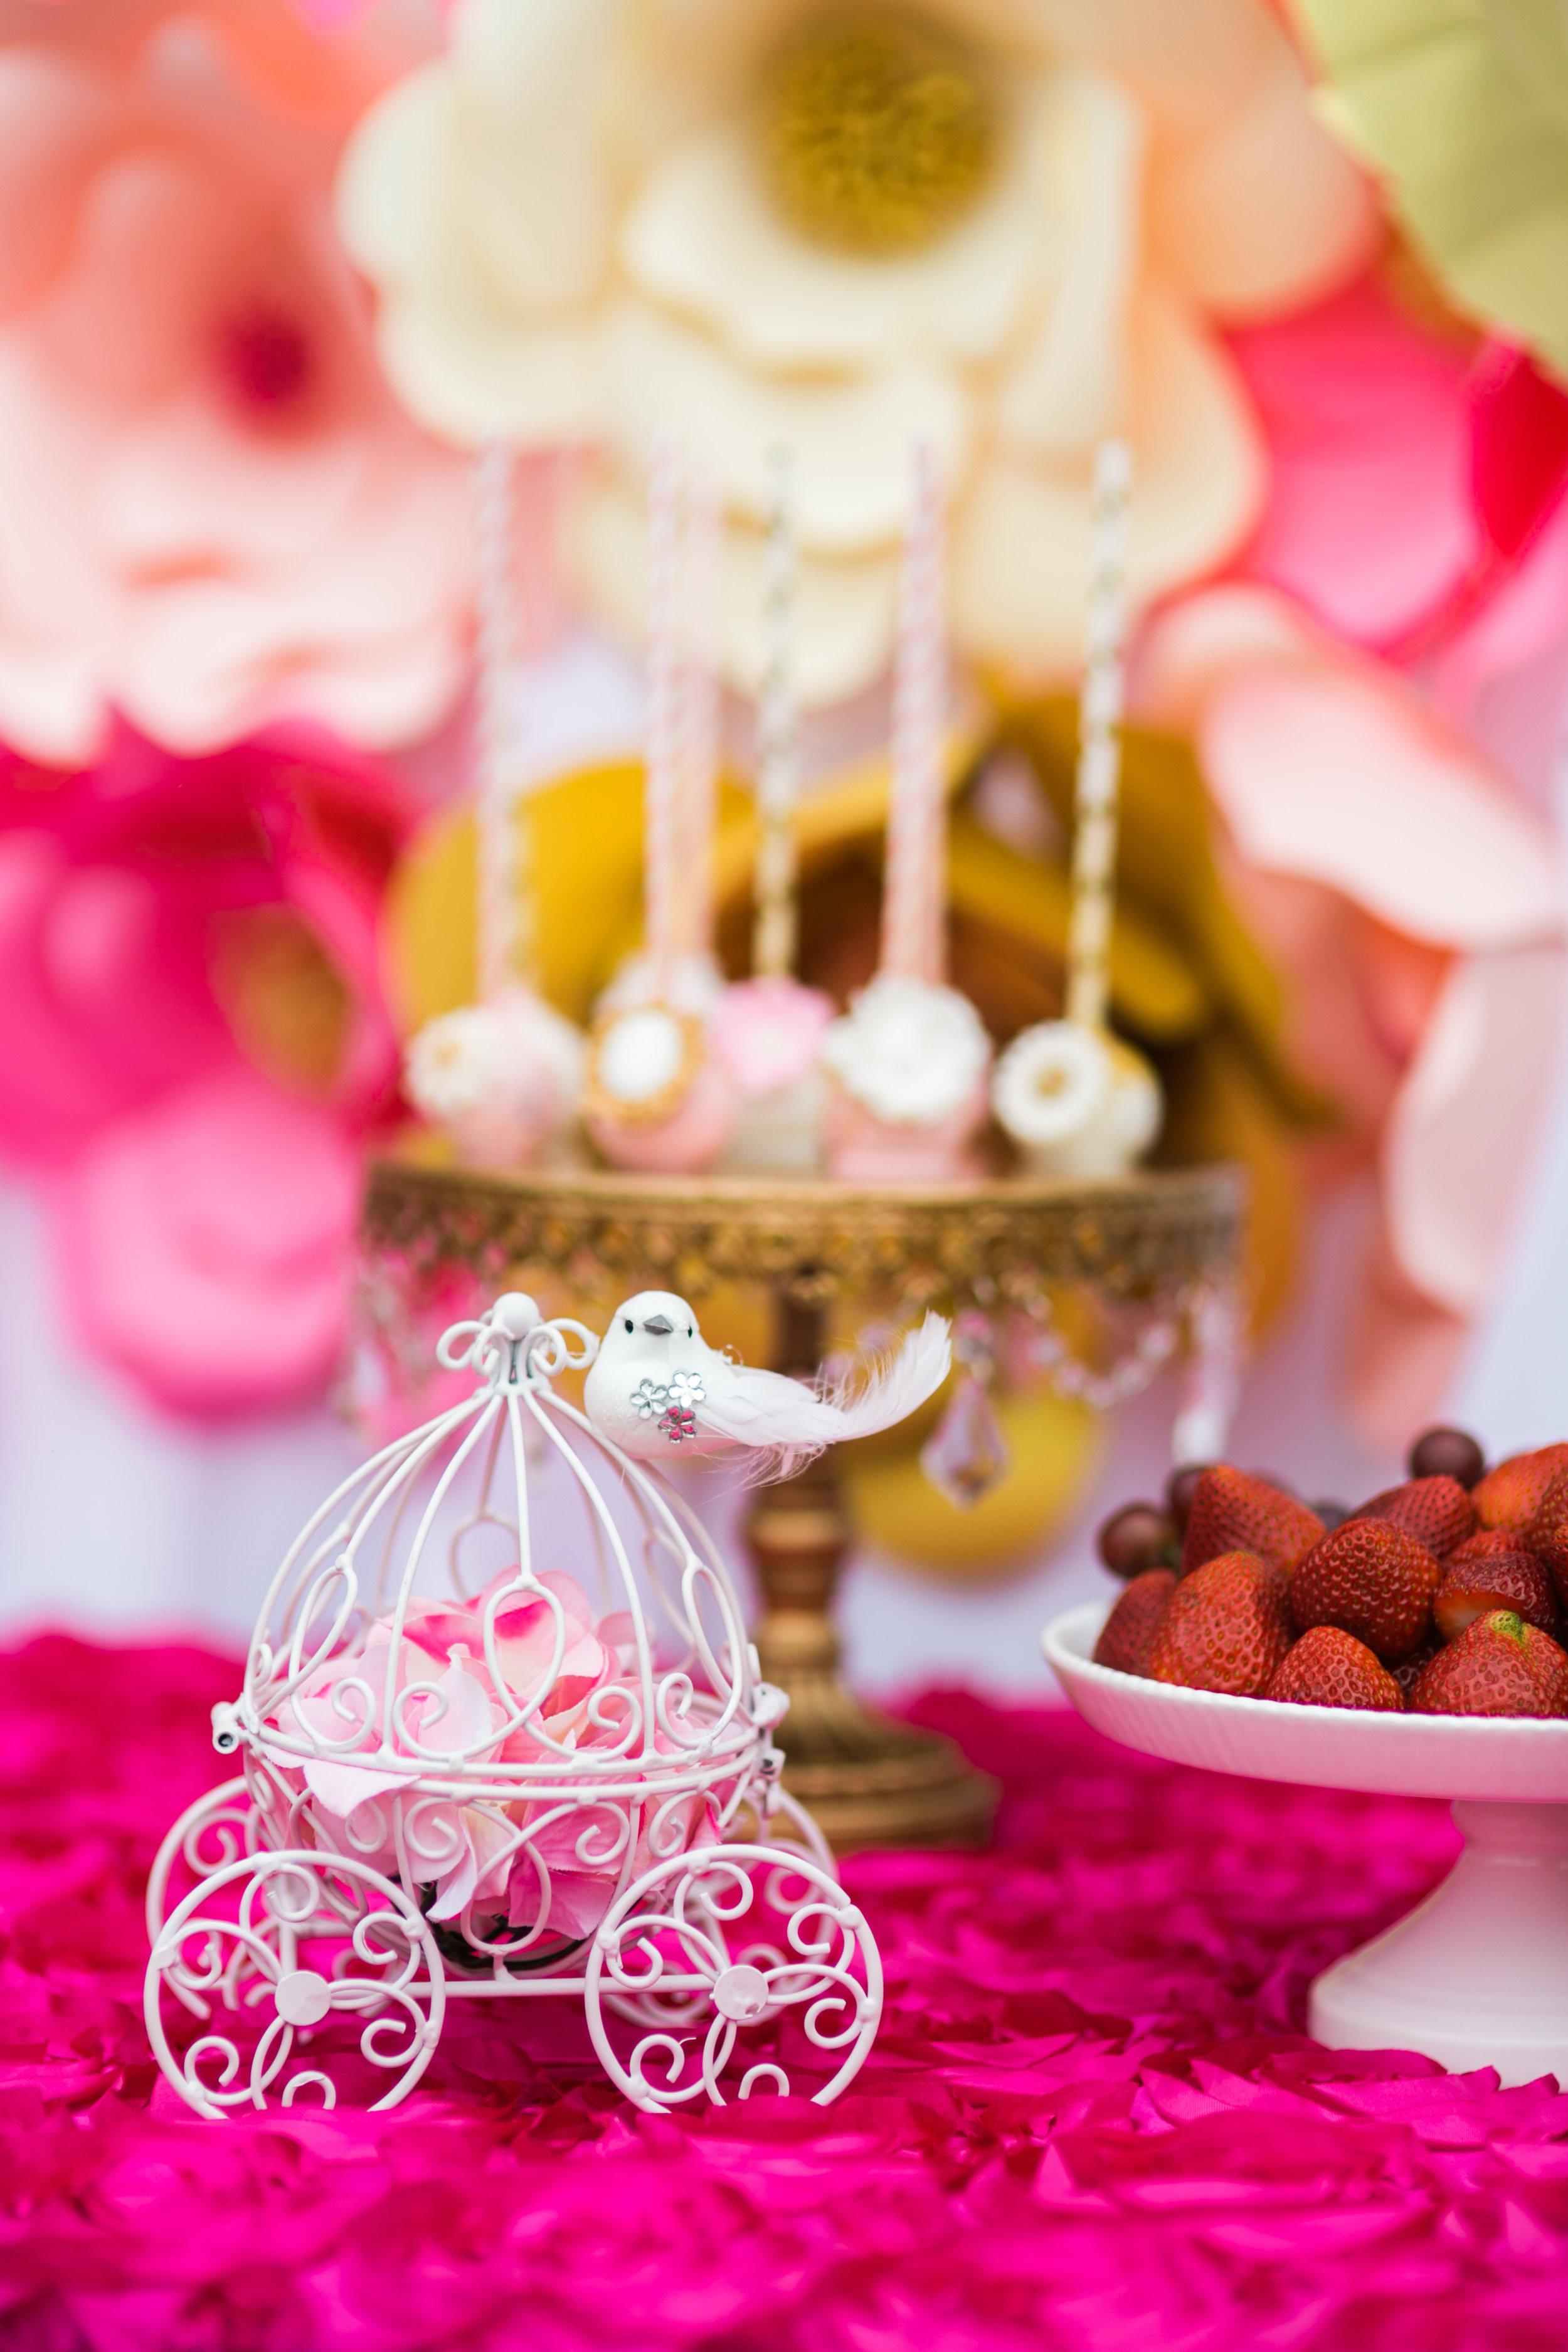 opulent-treasures-cakestand-Bday-designsbyalexandra_.jpg